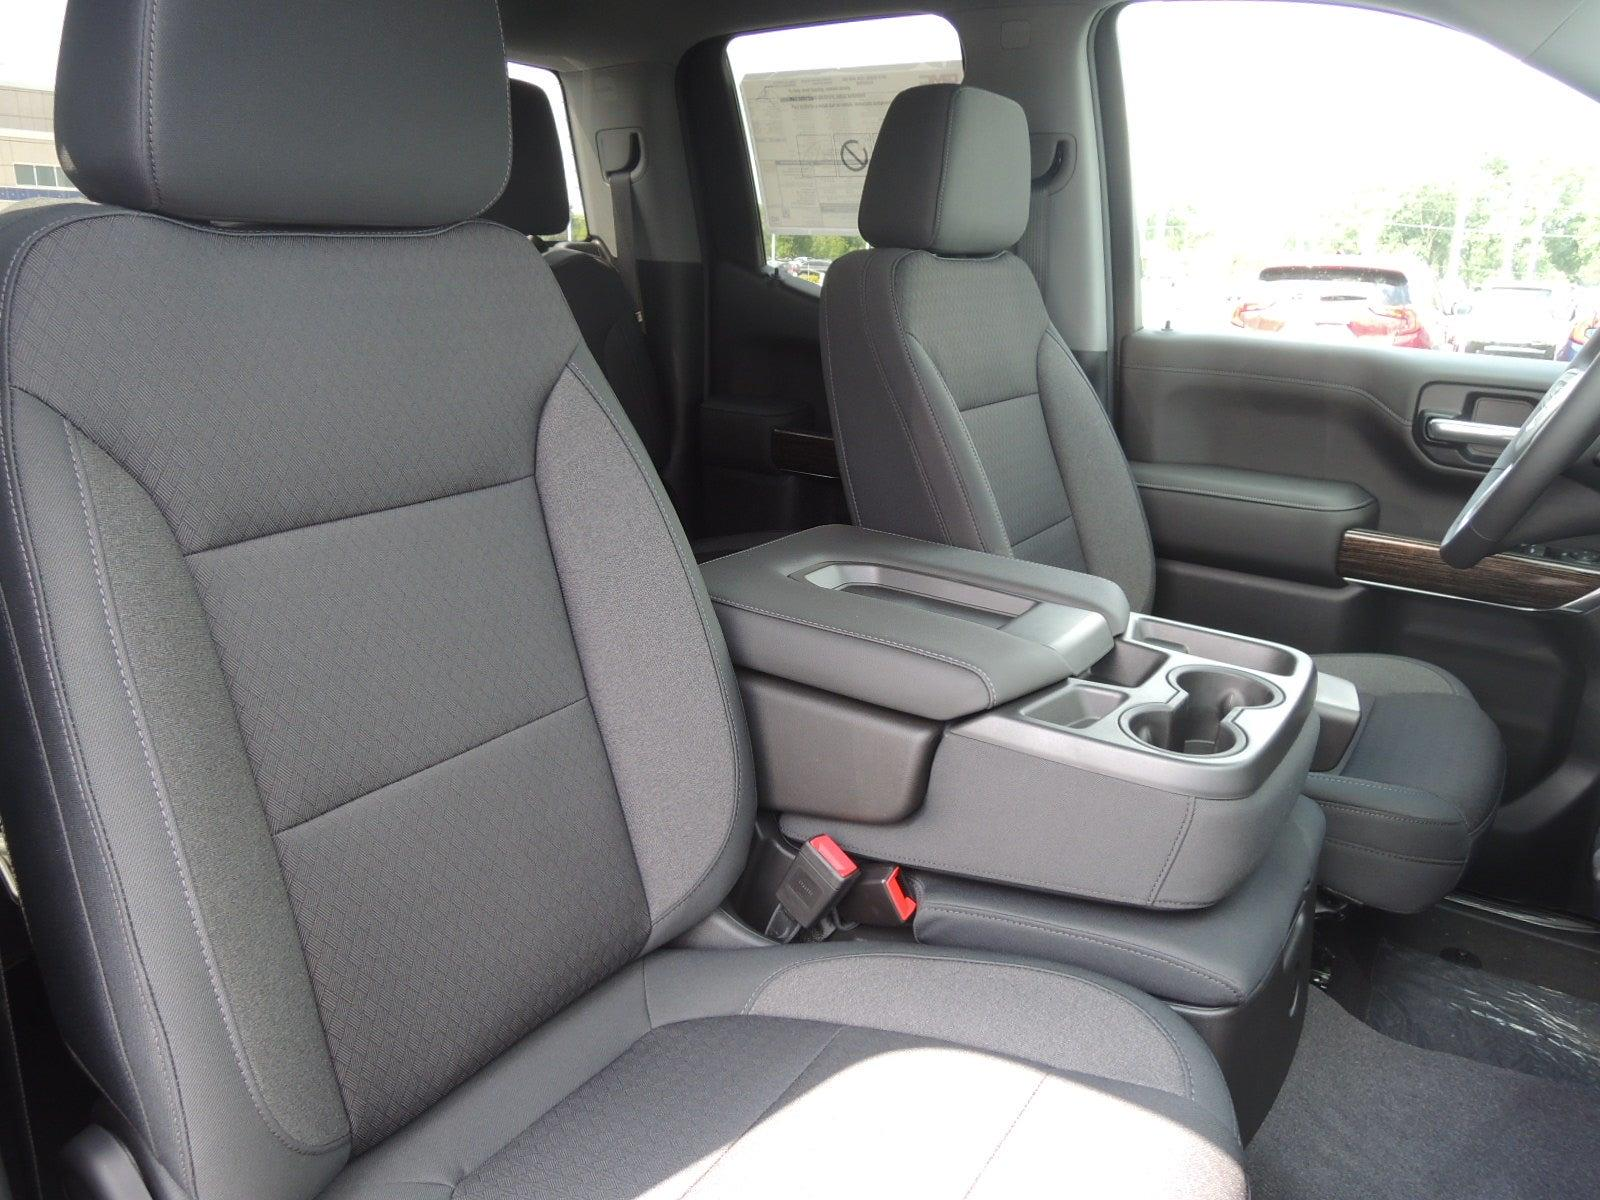 2021 GMC Sierra 1500 Double Cab 4x2, Pickup #MT715 - photo 15